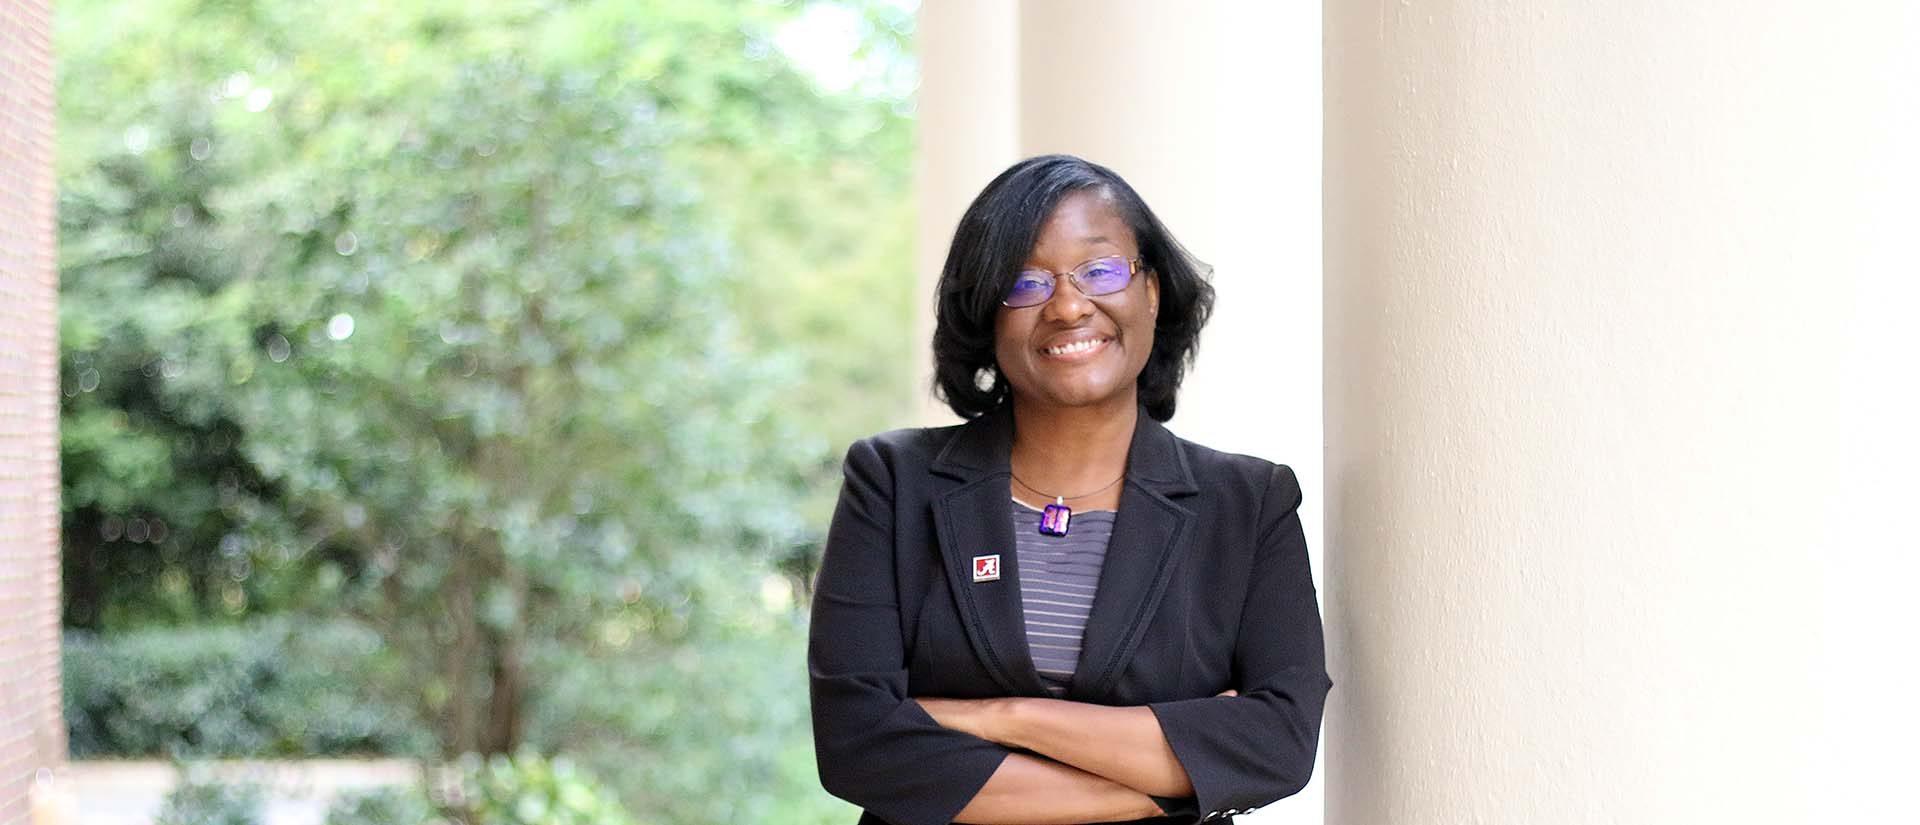 Javonda Williams is an Associate Professor of Social Work at The University of Alabama